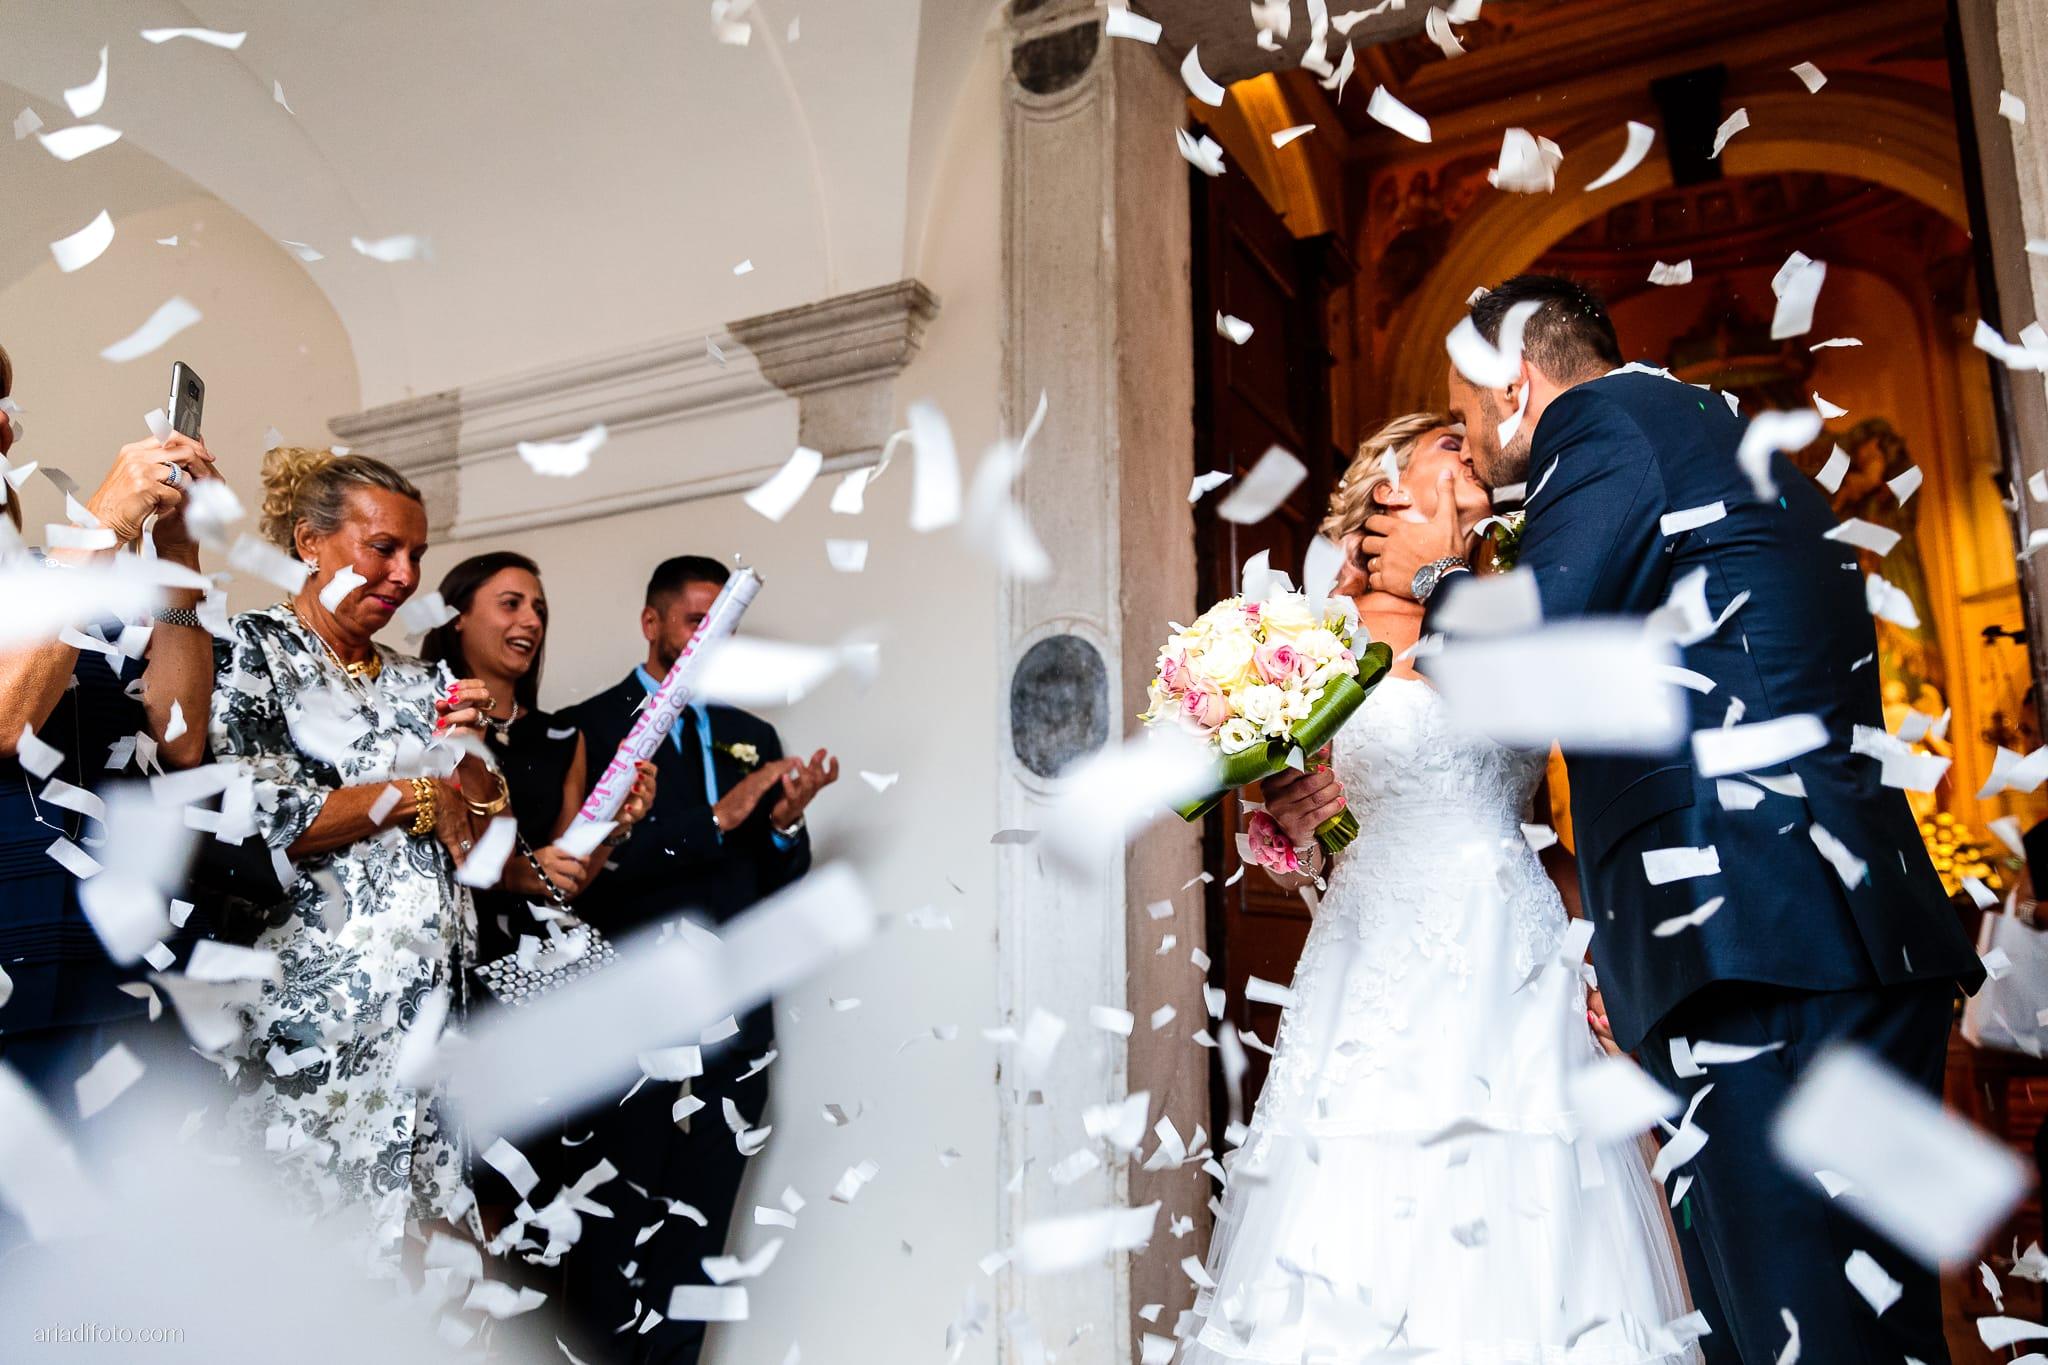 Nicoletta Pierfrancesco Matrimonio Gorizia Villa Attems Lucinico Cerimonia Chiesa Sant'Antonio lancio del riso